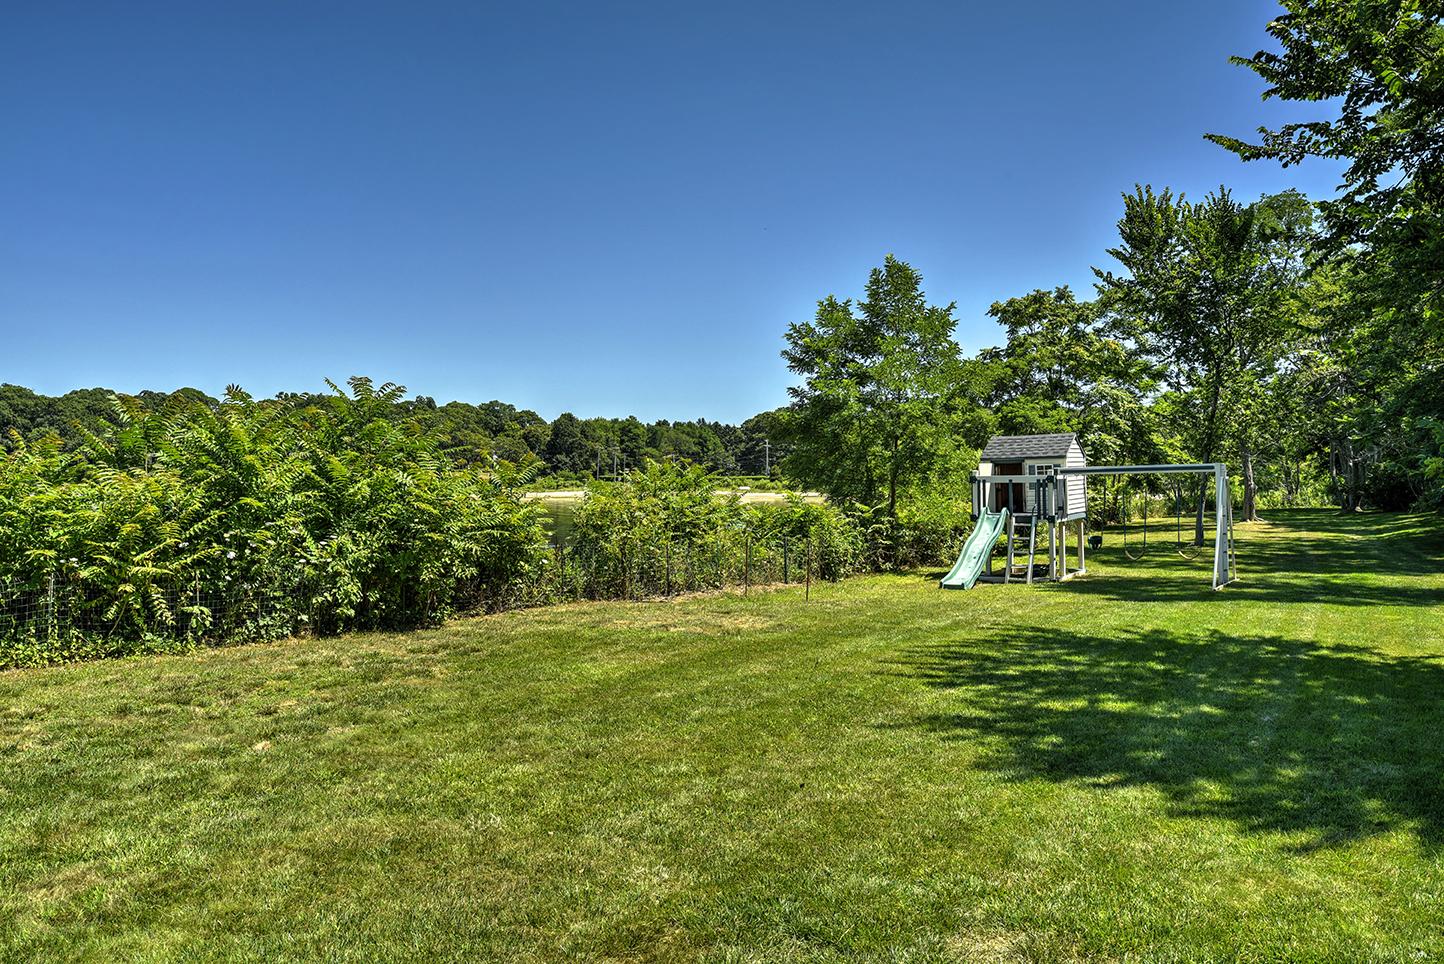 29-Winthrop-Rd-lawn.jpg